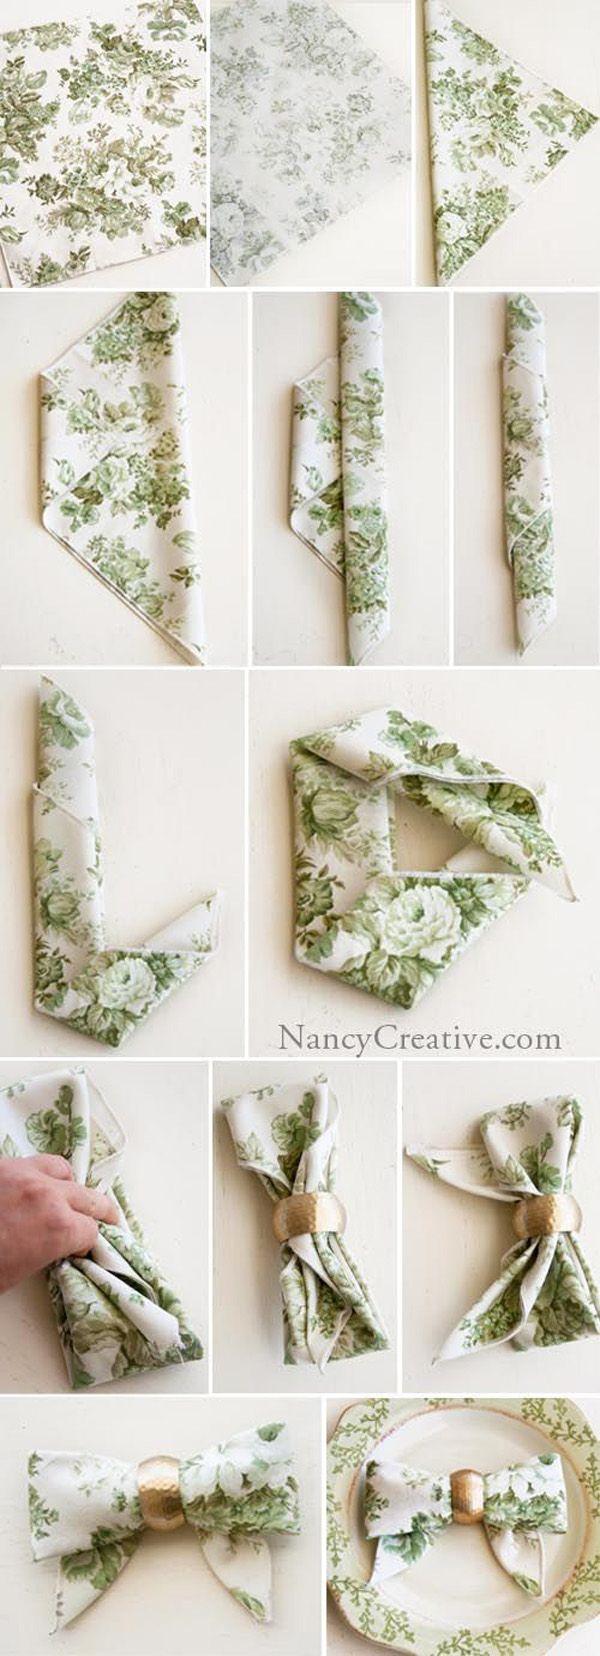 Napkin Folds - 35 Beautiful Examples of Napkin Folding <3 <3